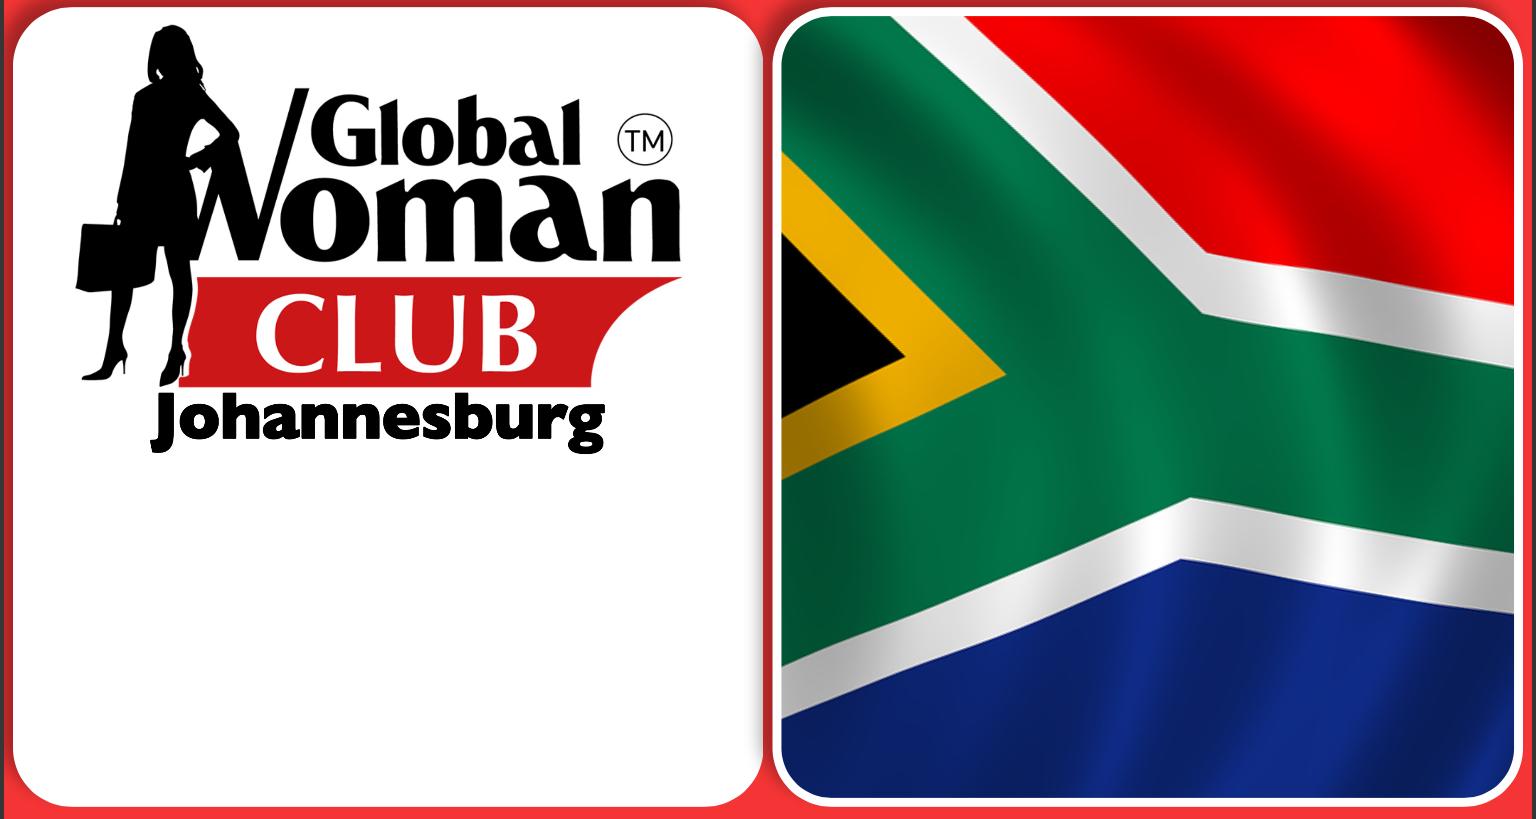 GLOBAL WOMAN CLUB JOHANNESBURG: BUSINESS NETWORKING MEETING - AUGUST